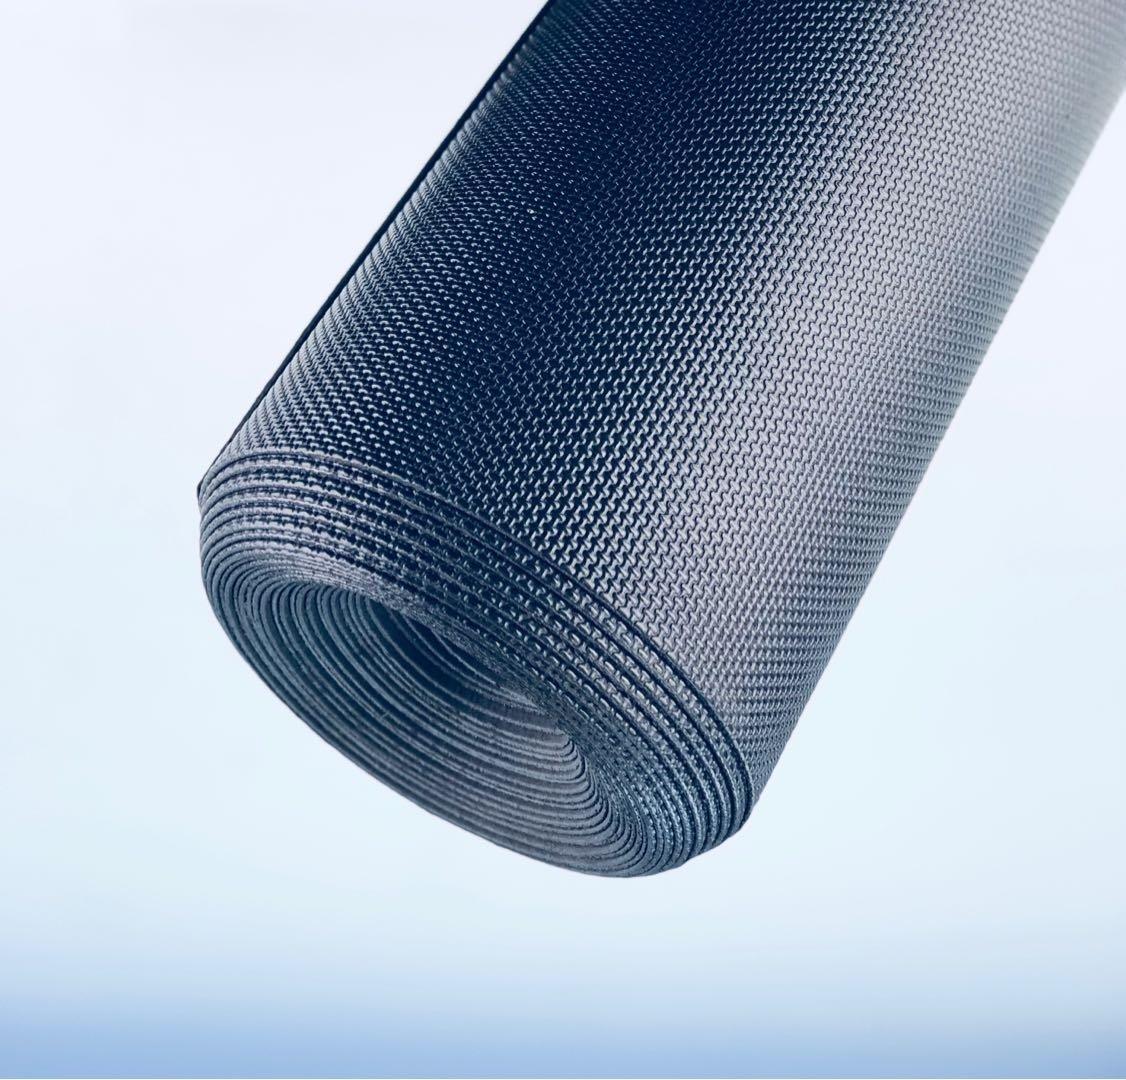 AMERIQUE 691322303438 Premium 3Rd Generation Unique and Durable Embossed Diamond Plate Metallic Vinyl Flooring, Roll Size: 2Mm x 4' x 25' 100Sqft, Black Diamond, 100 Square Feet